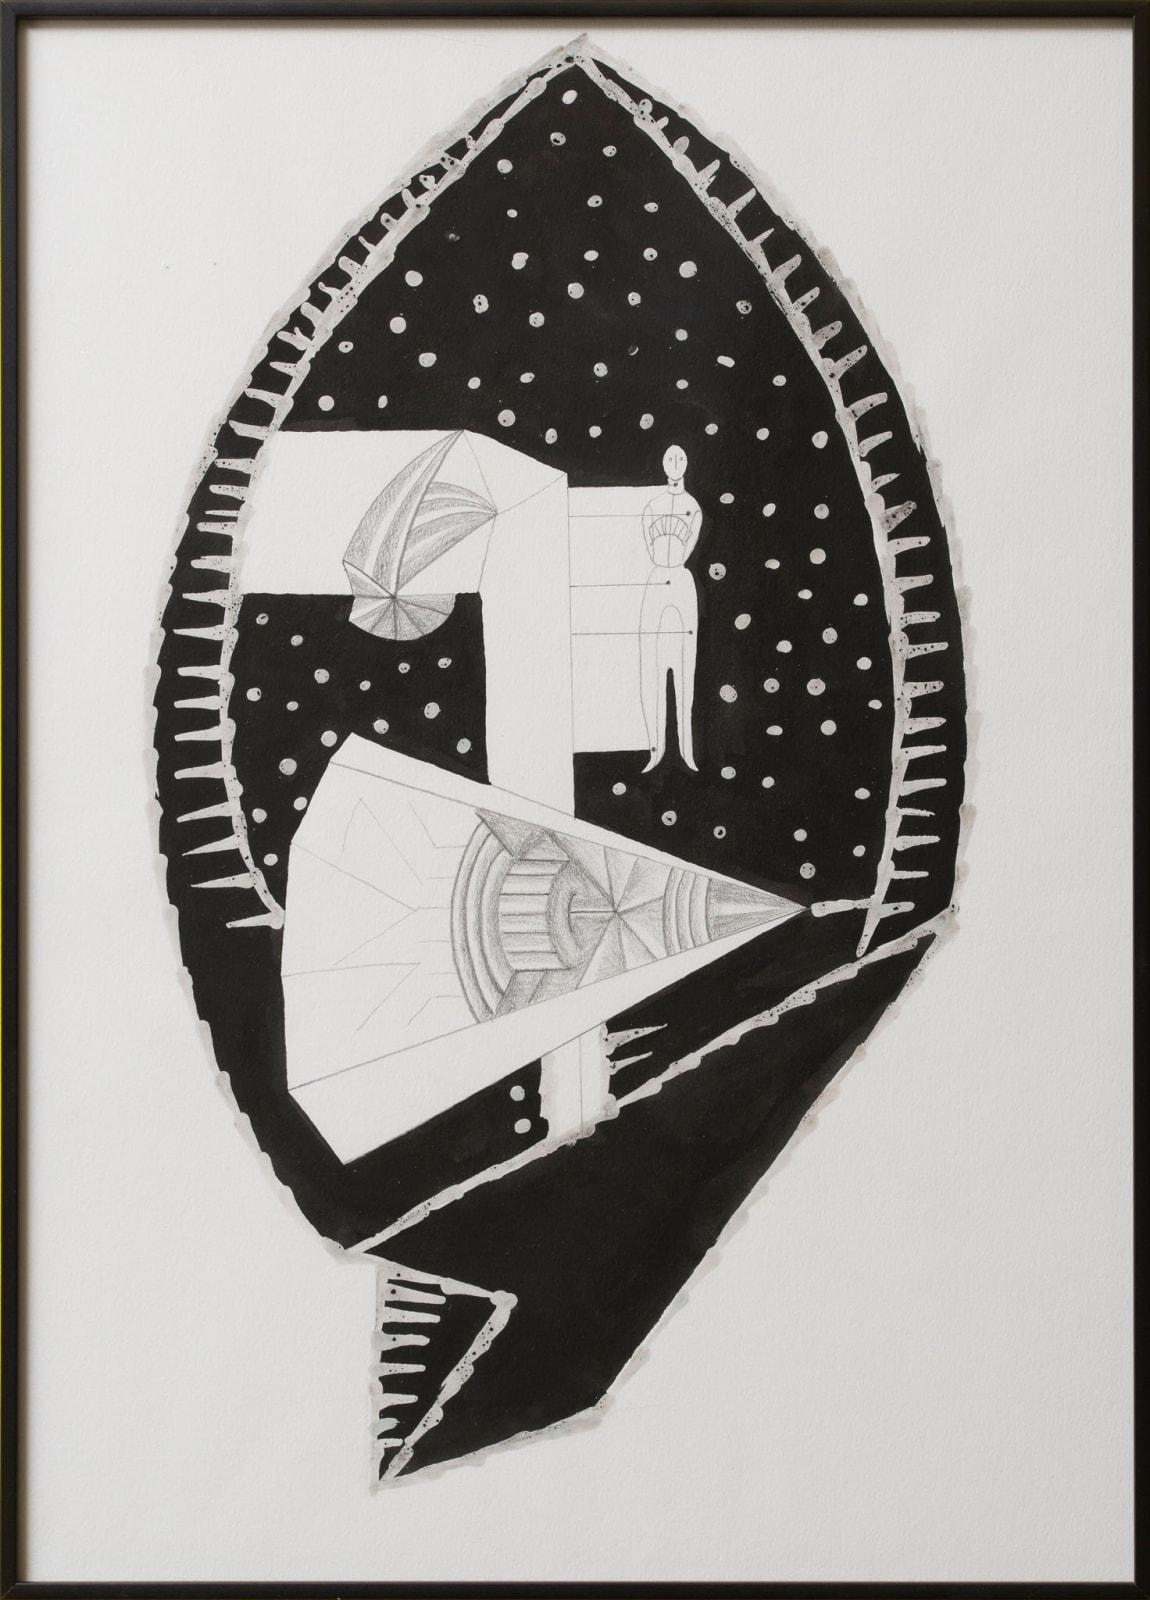 Anna Hulacova, Untitled, 2016, paper, graphite, ink, charcoal, wax 42,5 x 30,5 x 2 cm